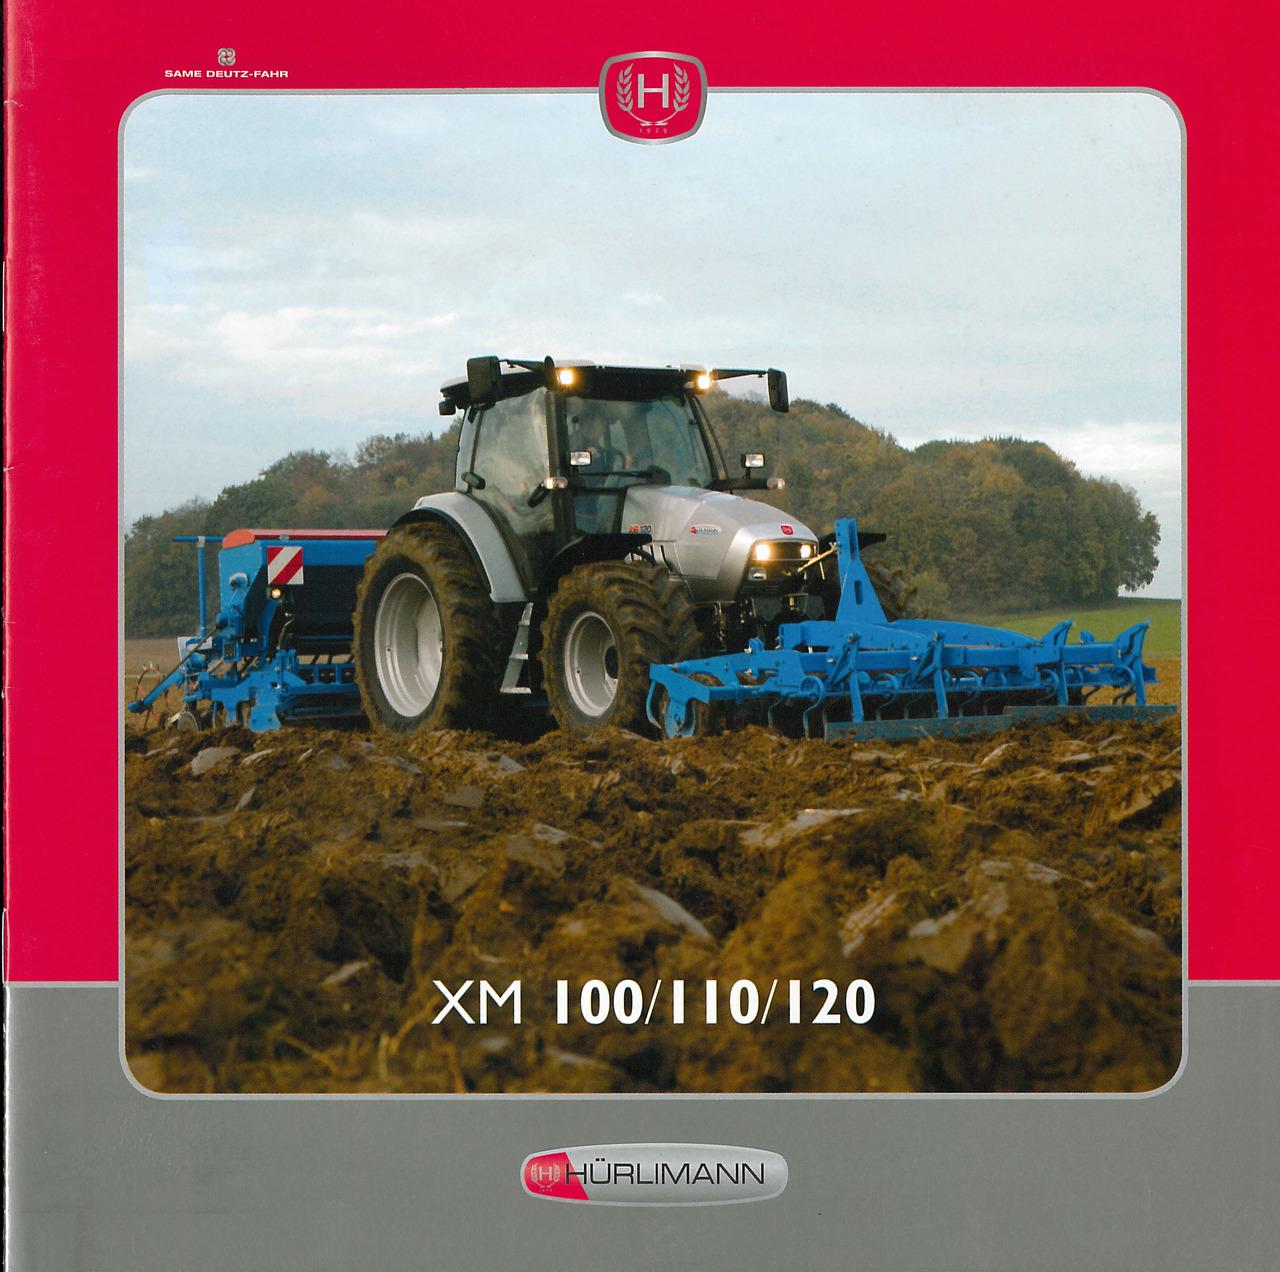 XM 100-110-120